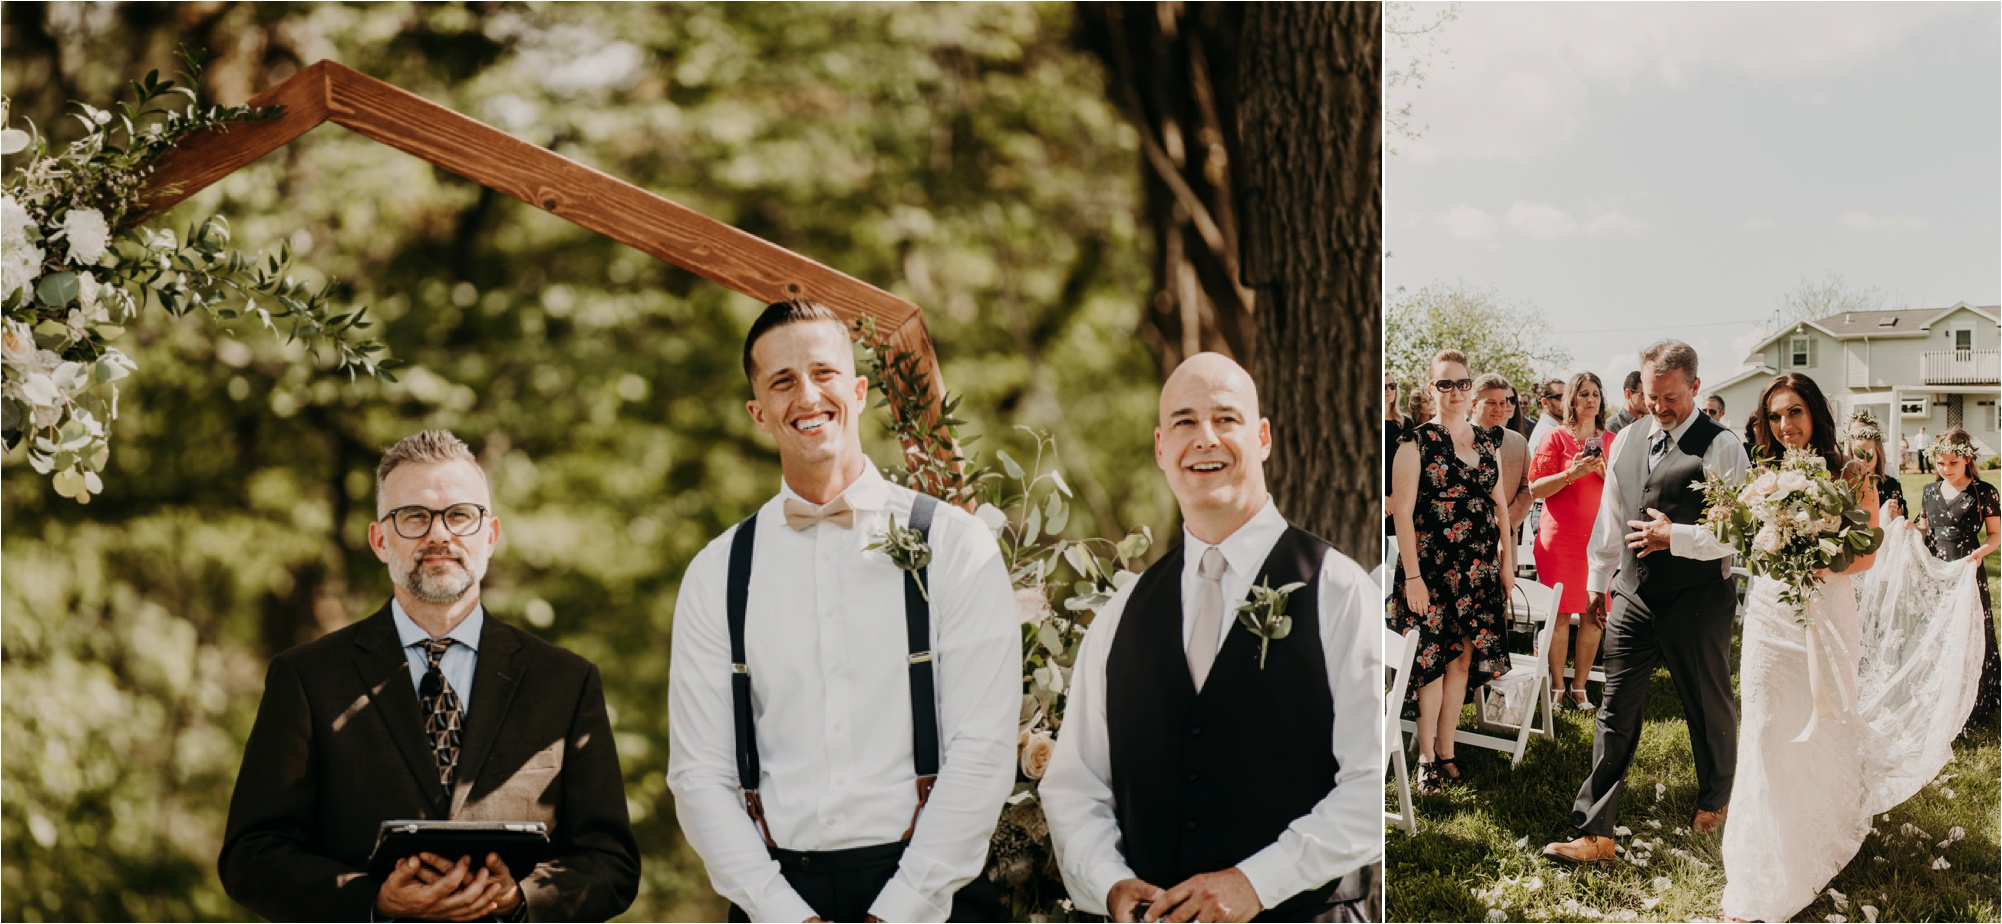 The Barn and Black Ridge Wedding Minneapolis Wedding Photographer_4140.jpg